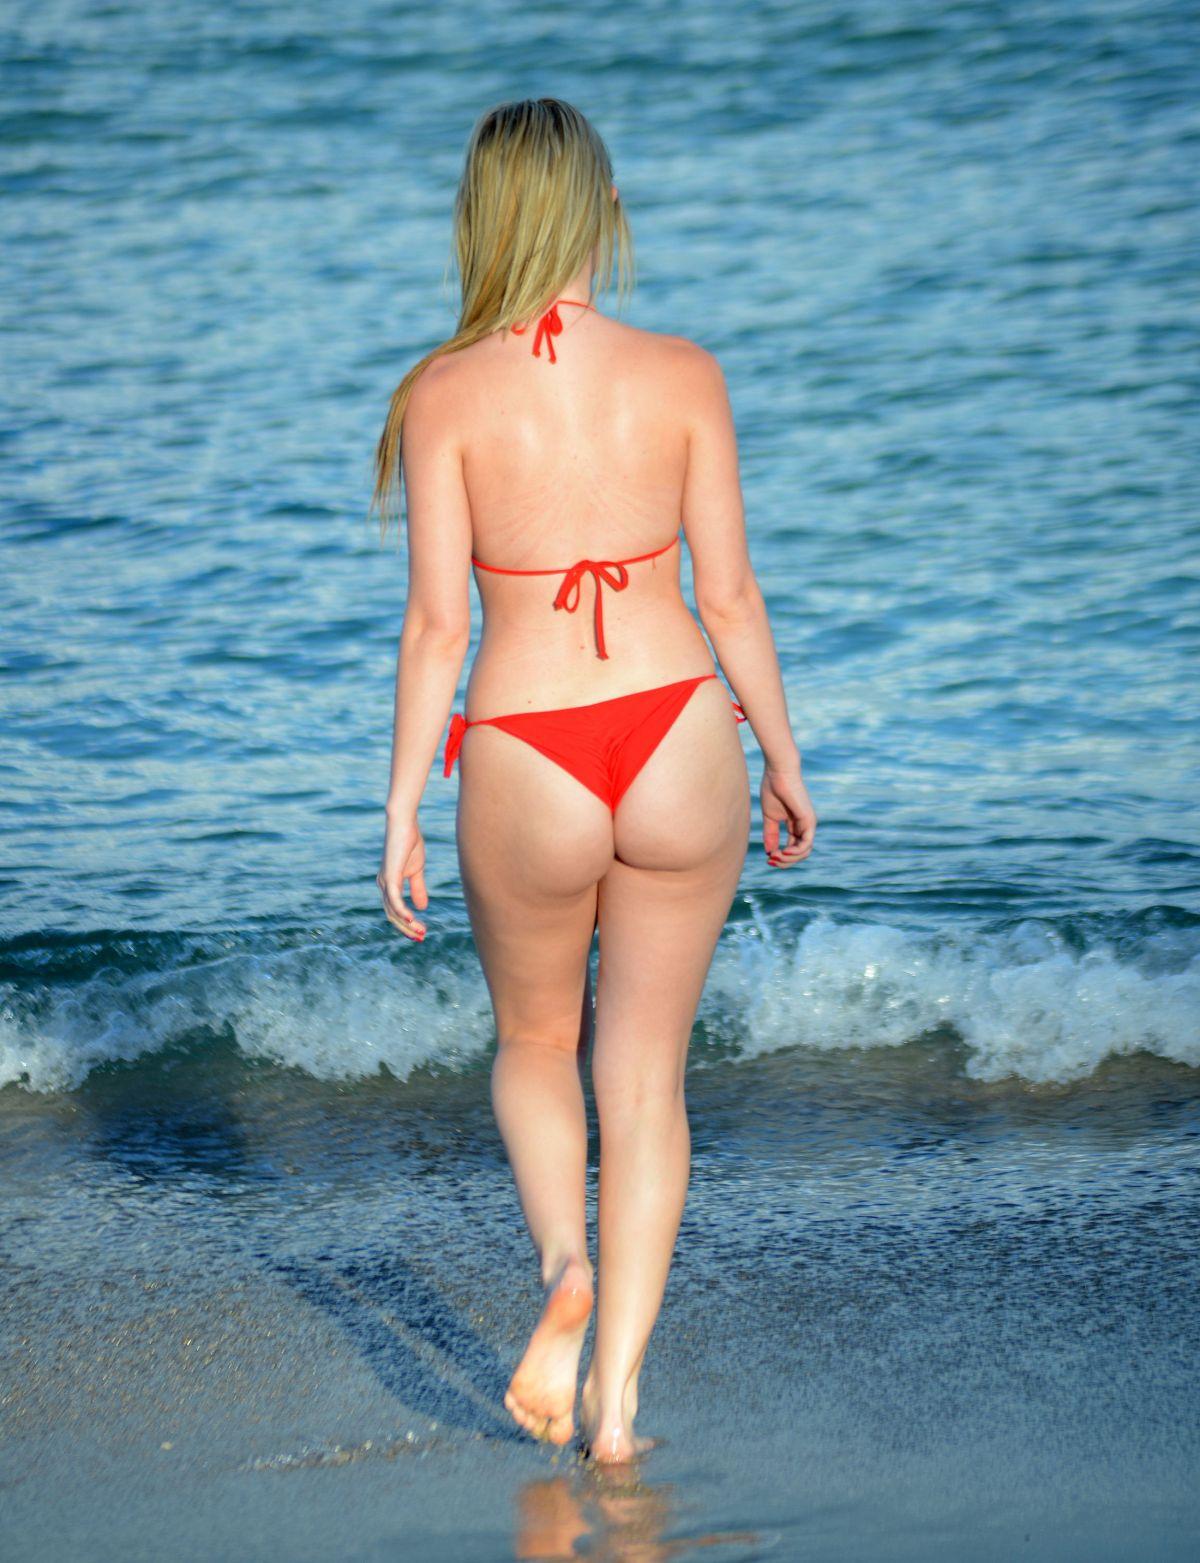 Rachel Sanders in Bikini on the Beach Pic 17 of 35